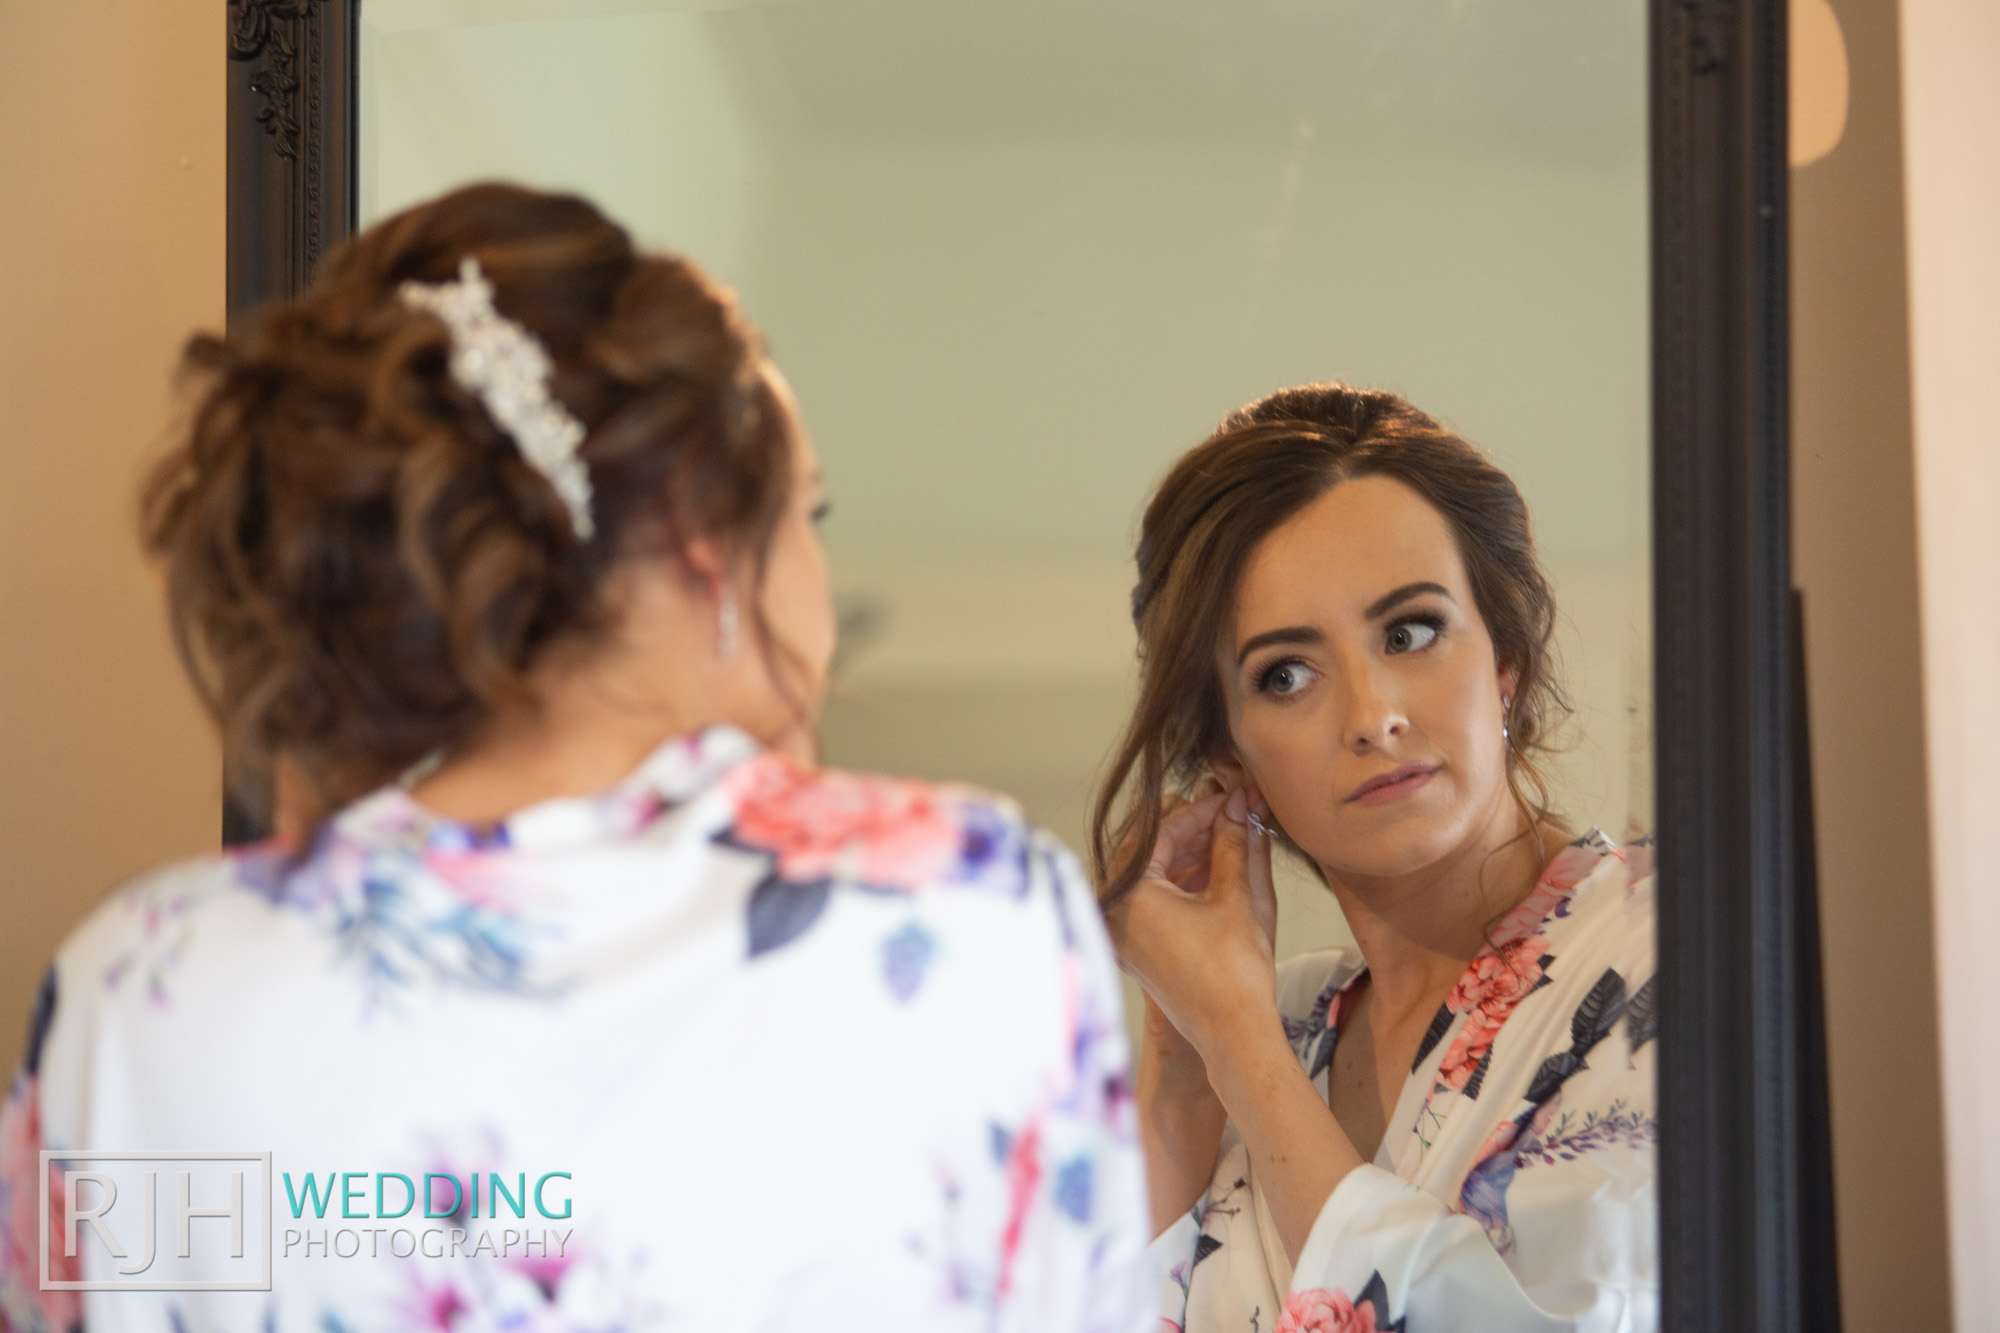 Whirlowbrook Hall Wedding Photography_Jack & Lydia_013_IMG_4161.jpg